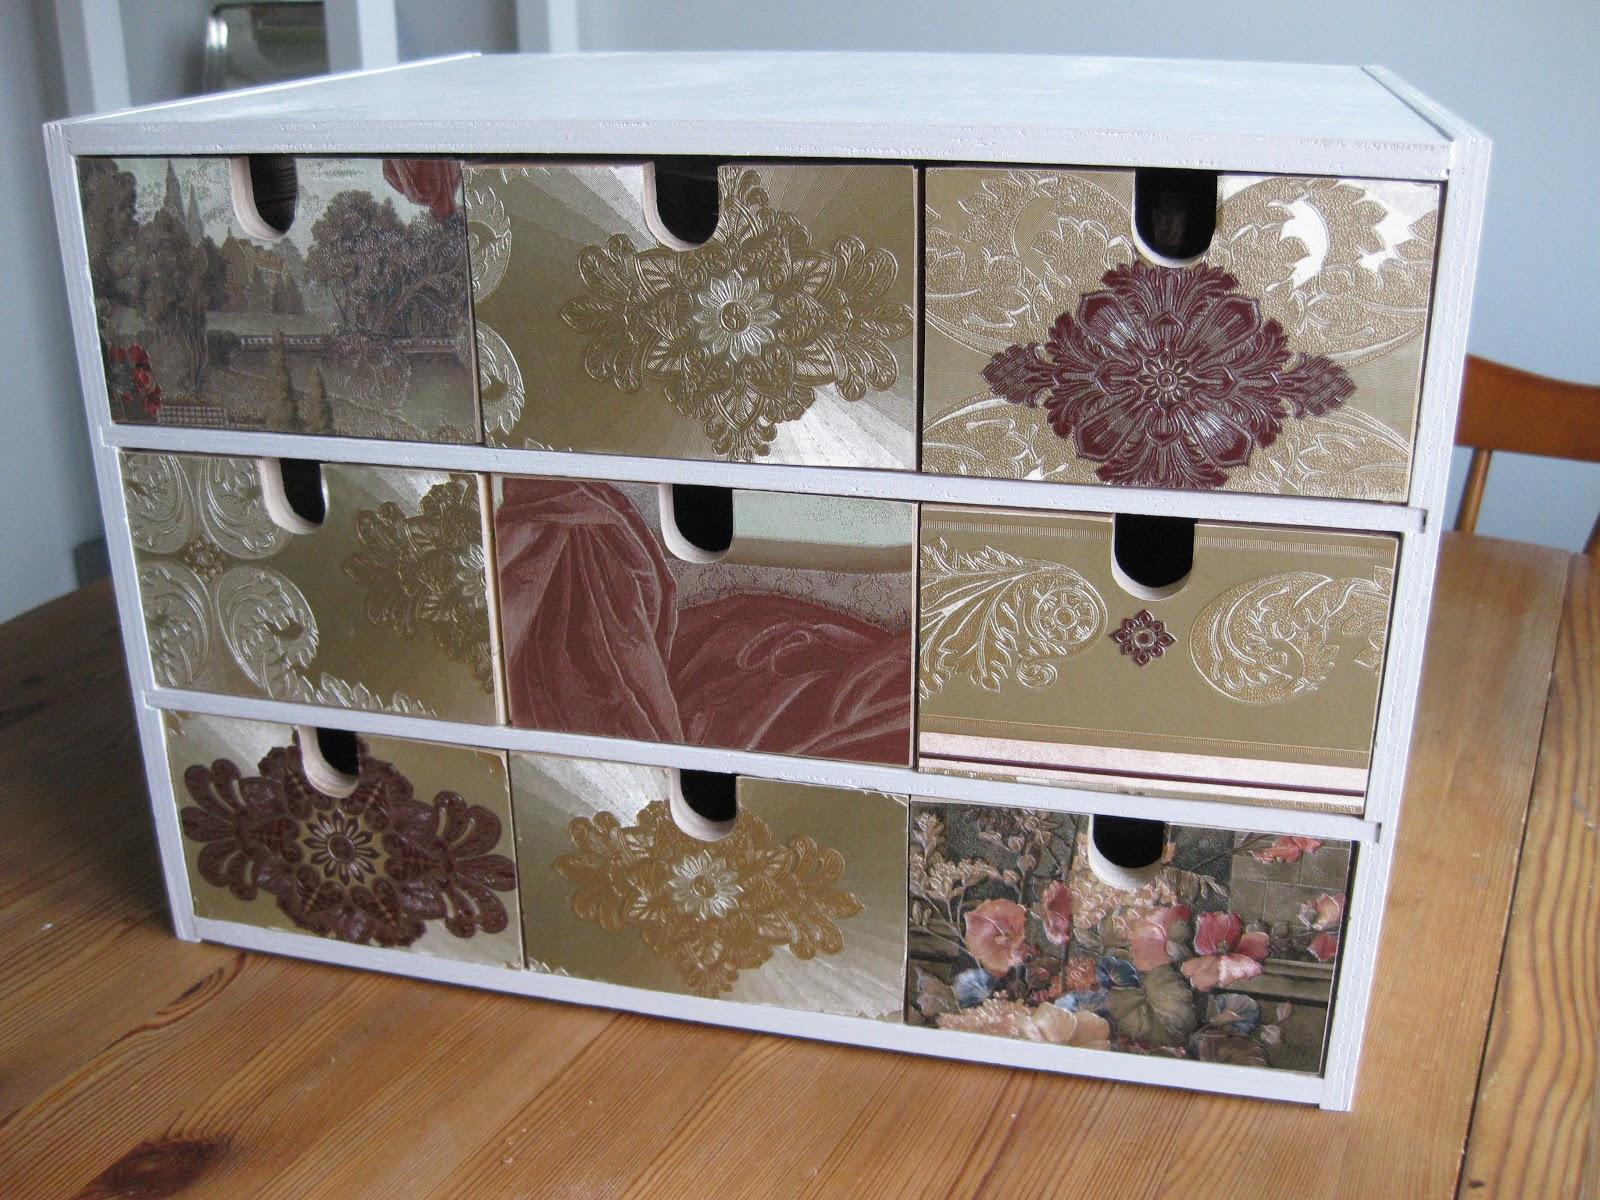 Mini Cassettiera Fai Da Te seaseight design blog: diy // ikea moppe // the mini chest